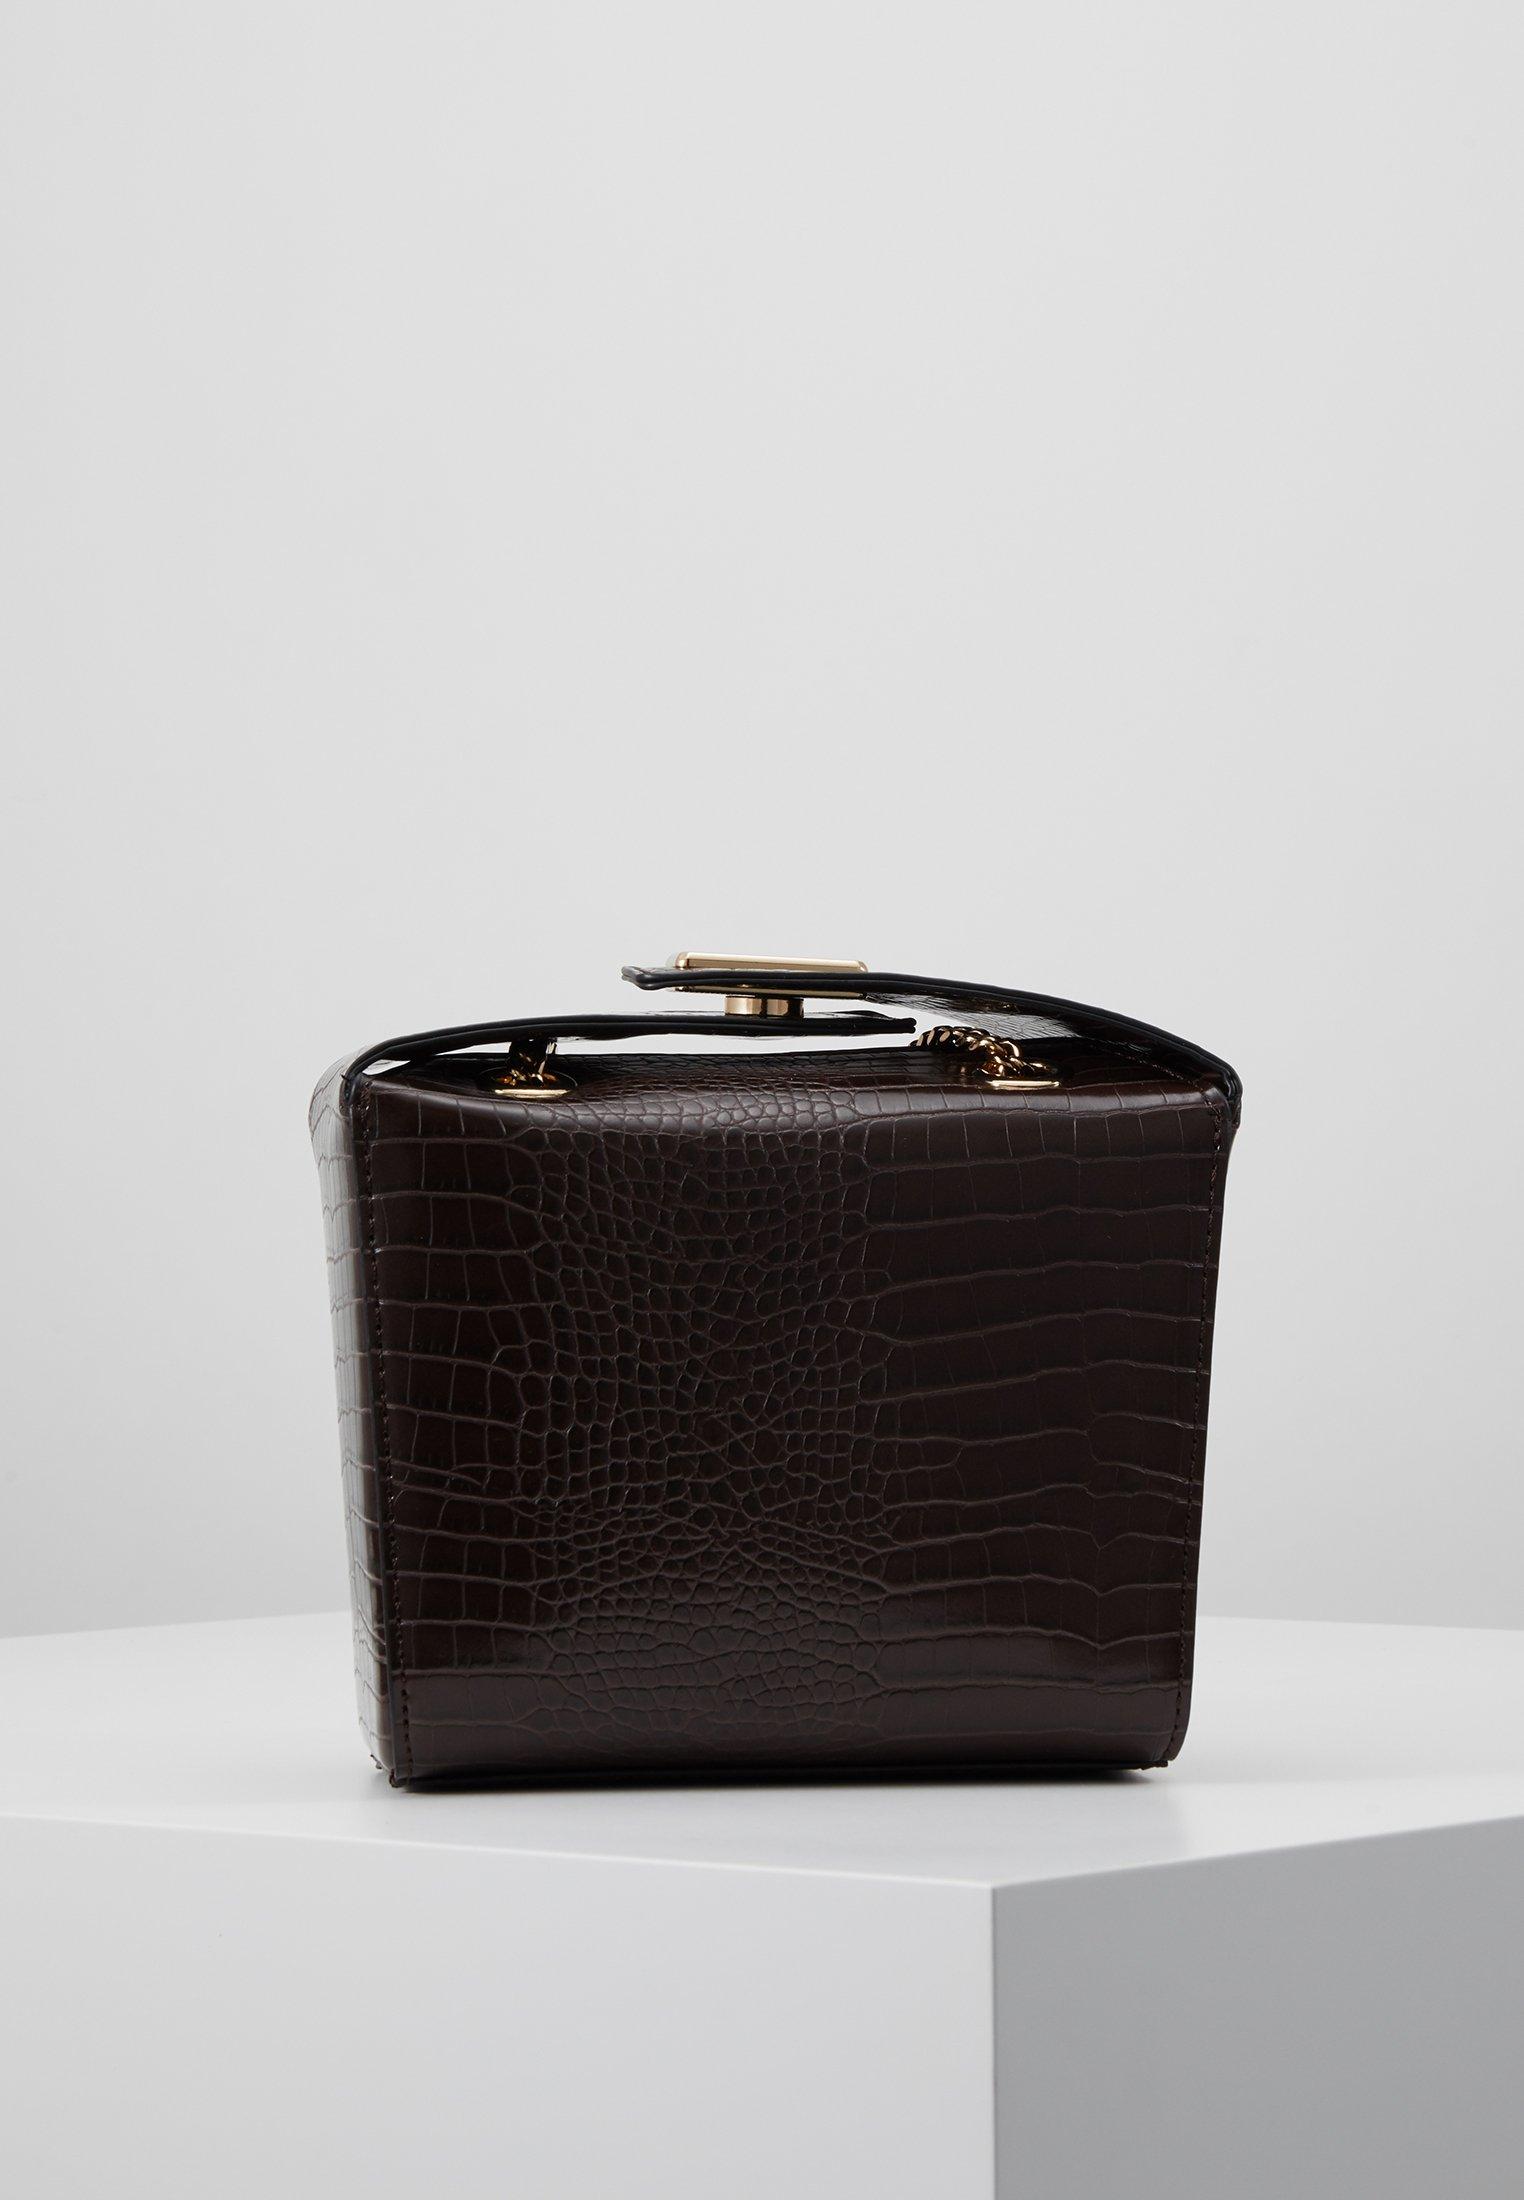 Topshop Cam Boxy - Borsa A Mano Brown GTQPV6N